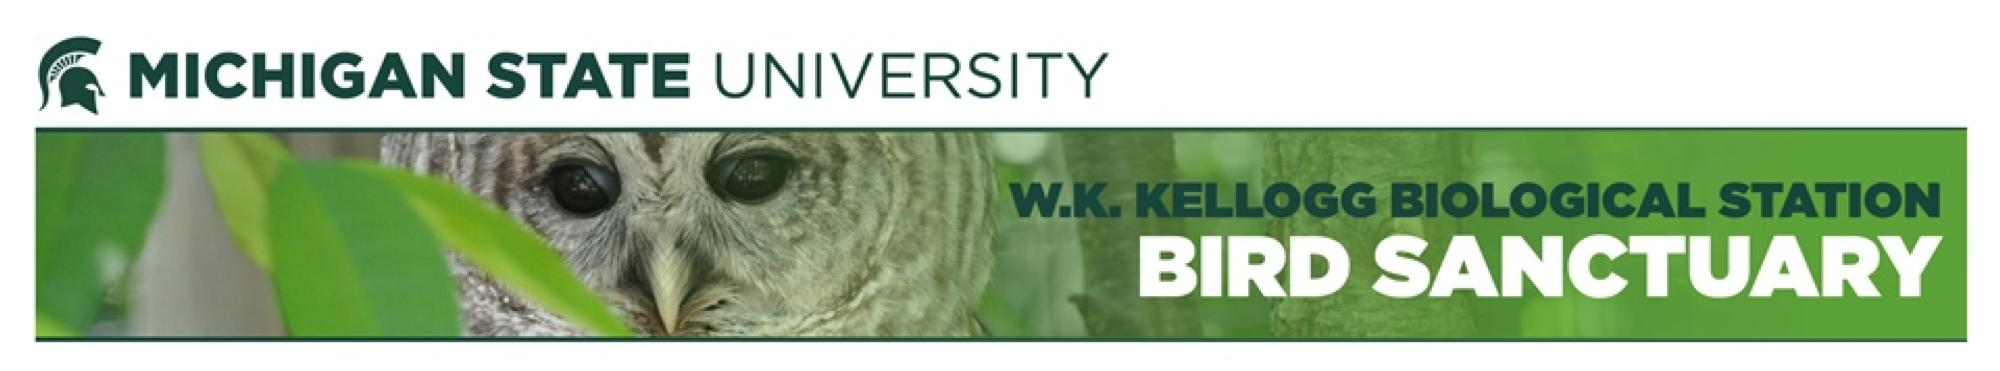 Michigan State University Kellogg Biological Station Kellogg Bird Sanctuary with image of Barred Owl.